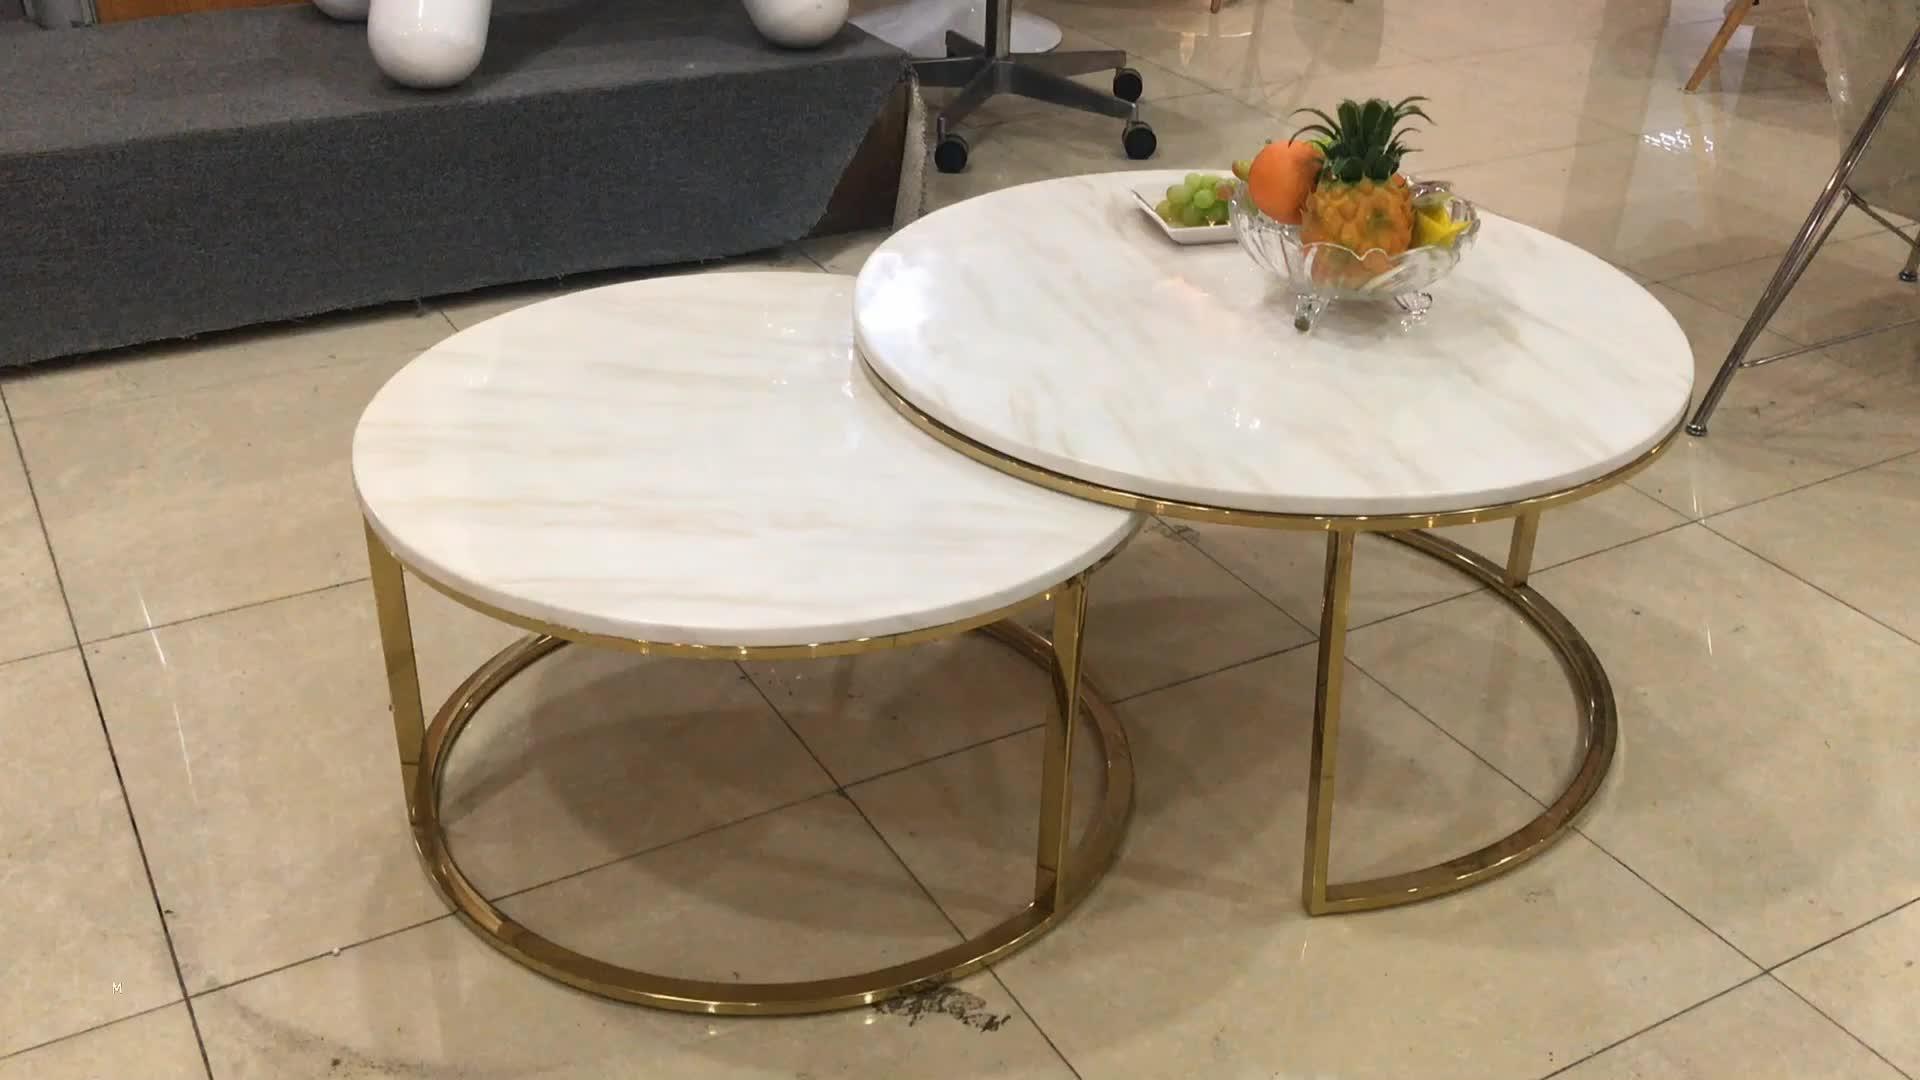 यूरोपीय शैली आधुनिक सफेद संगमरमर गोल्डन स्टेनलेस स्टील पैर दौर पक्ष कॉफी टेबल